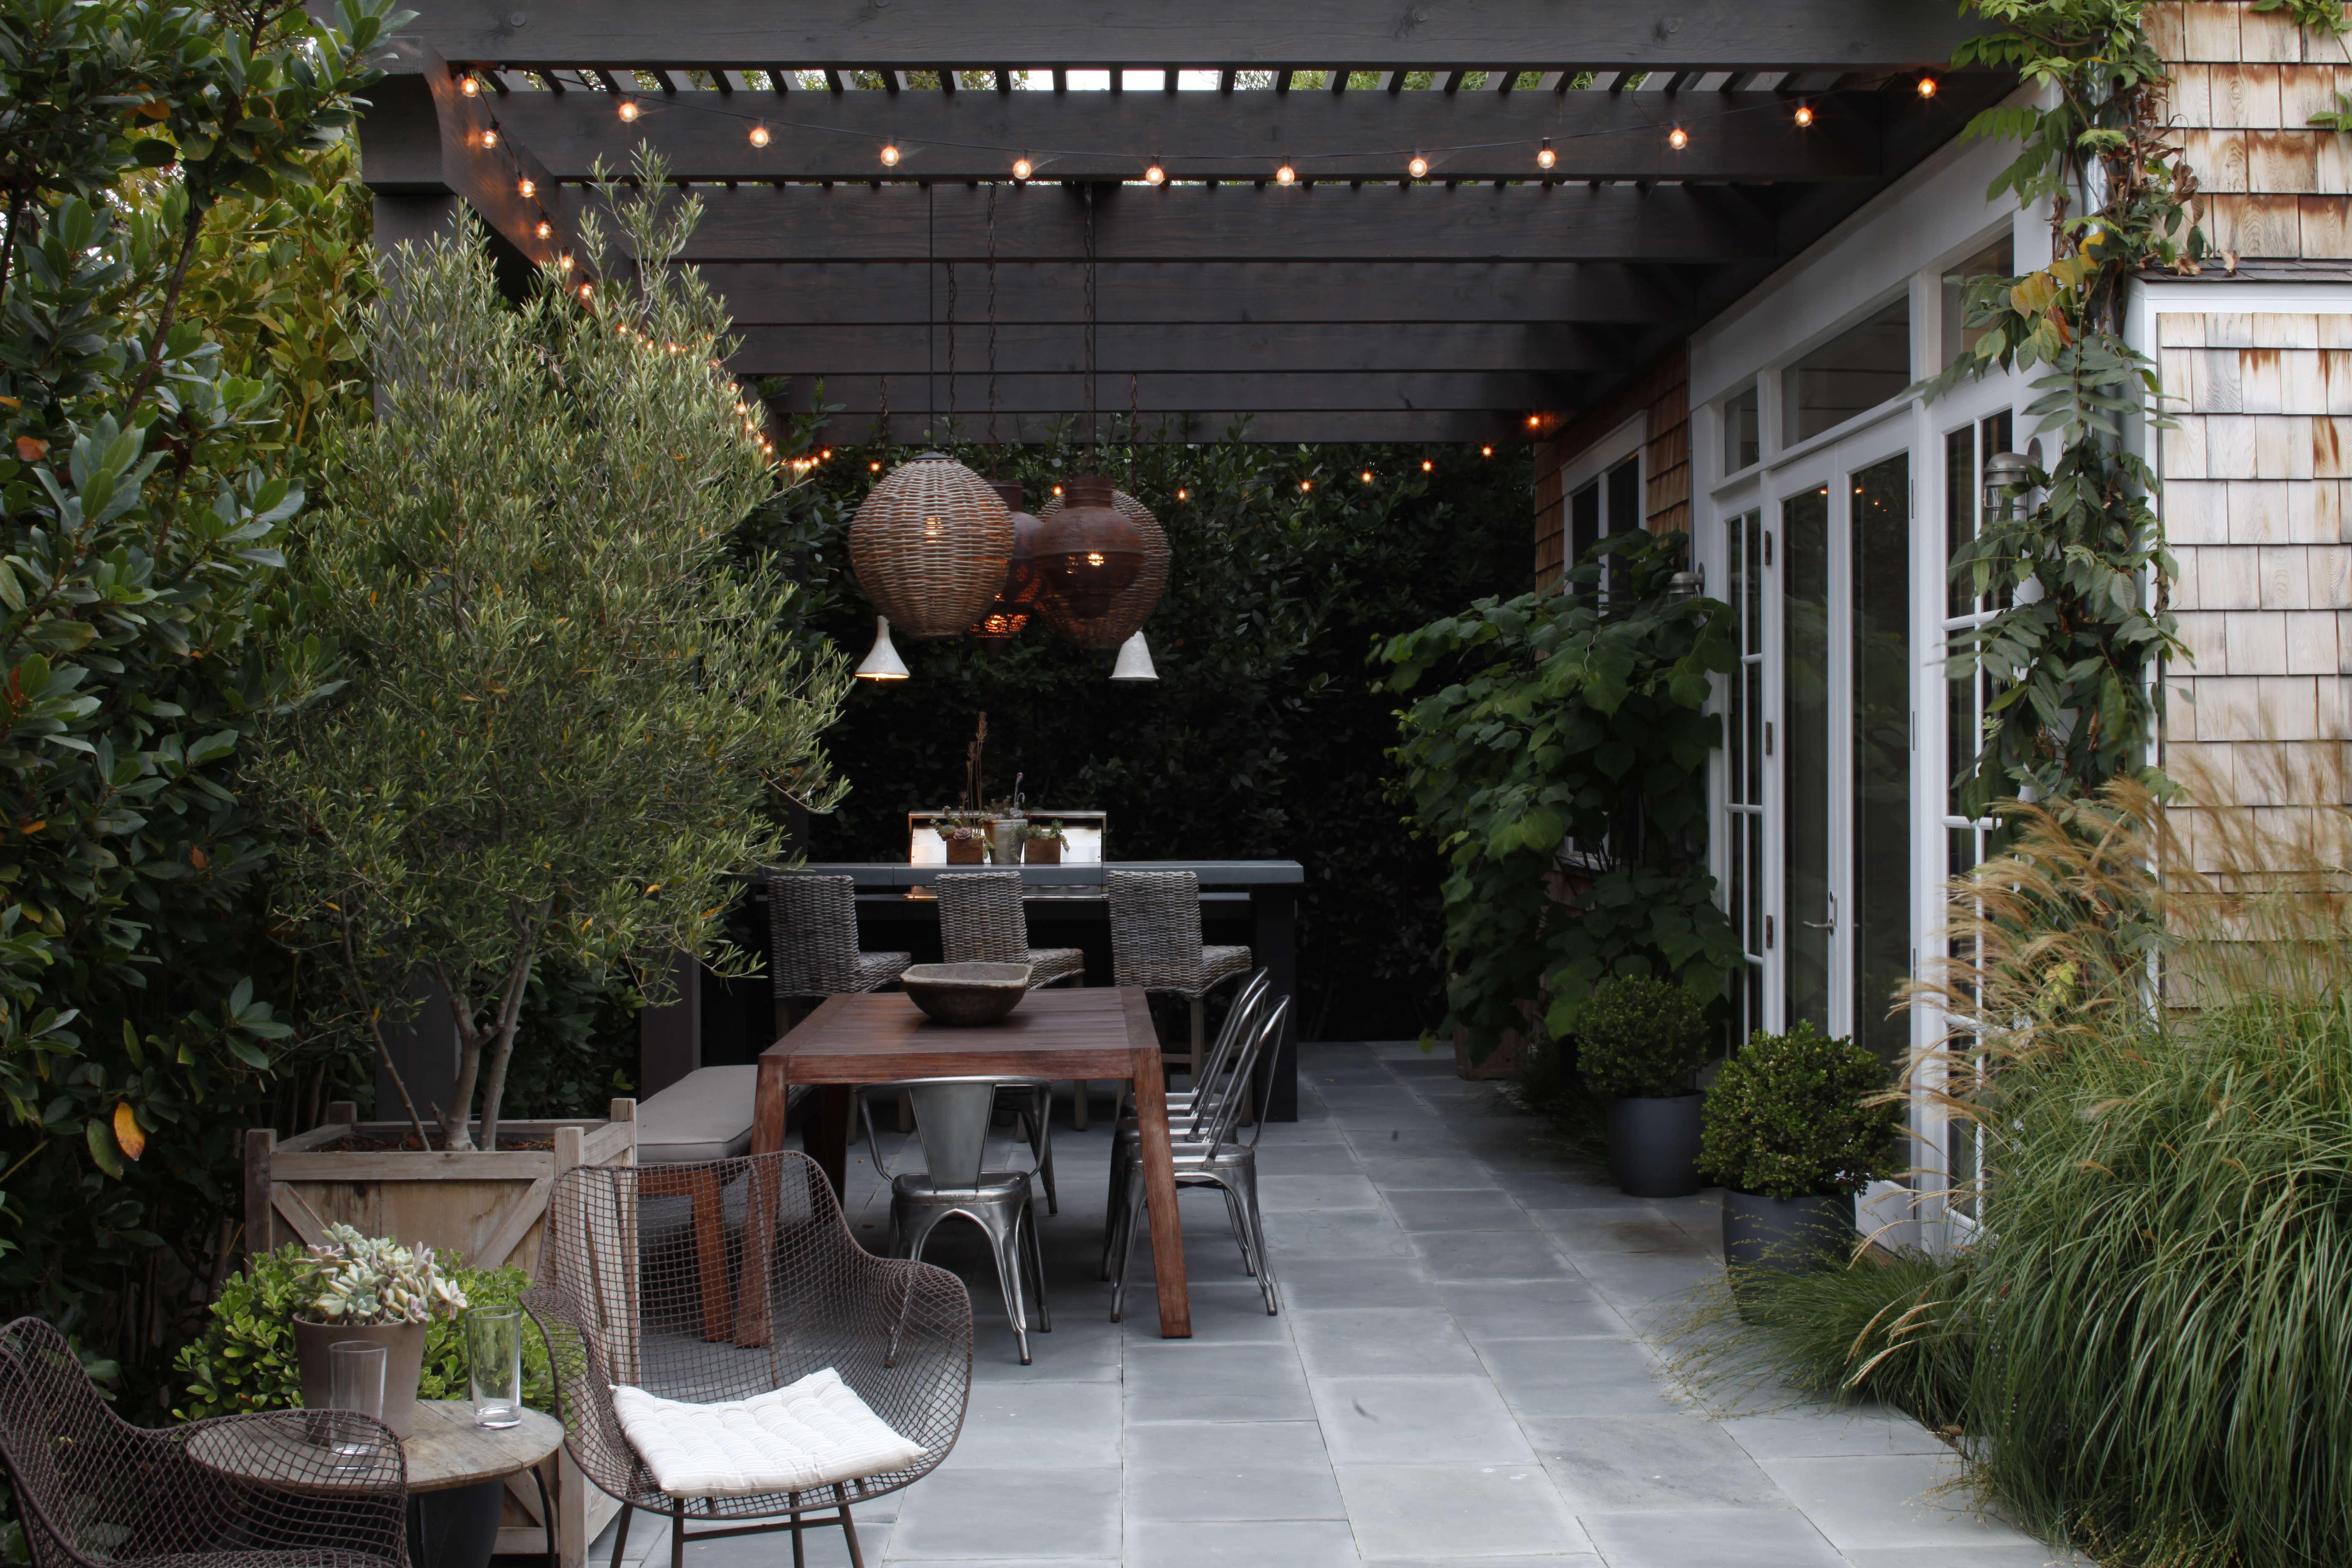 10 easy pieces patio pavers gardenista sourcebook for outdoor